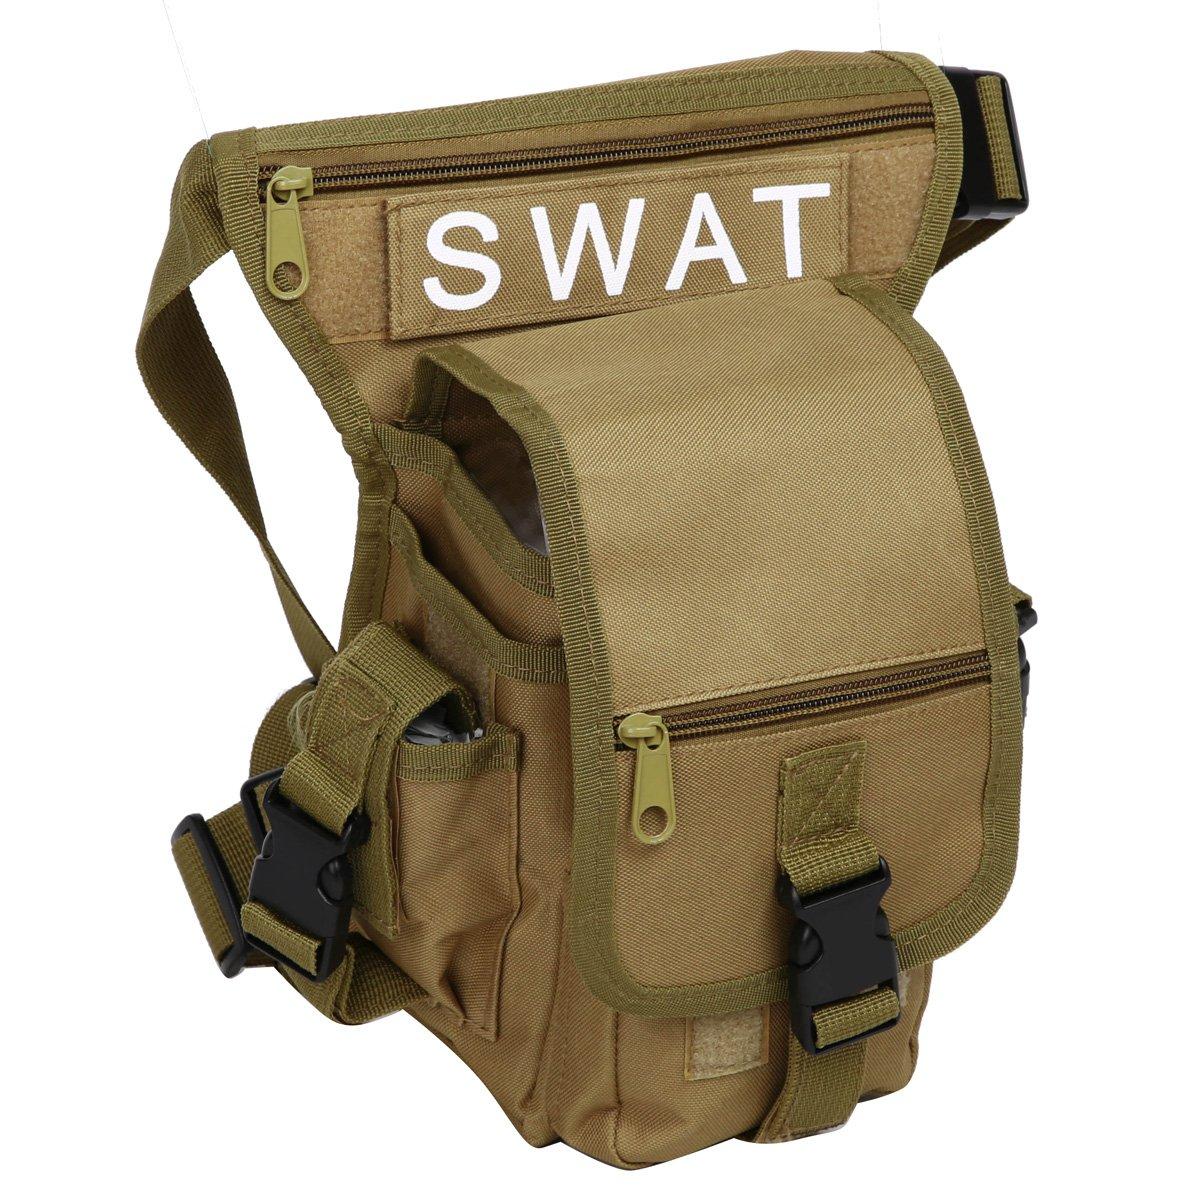 size 40 e2b45 dccfd Cintura mochilas Bolso o de Tela Pierna Eshow Hombre Lona de de para qwS7Ctw